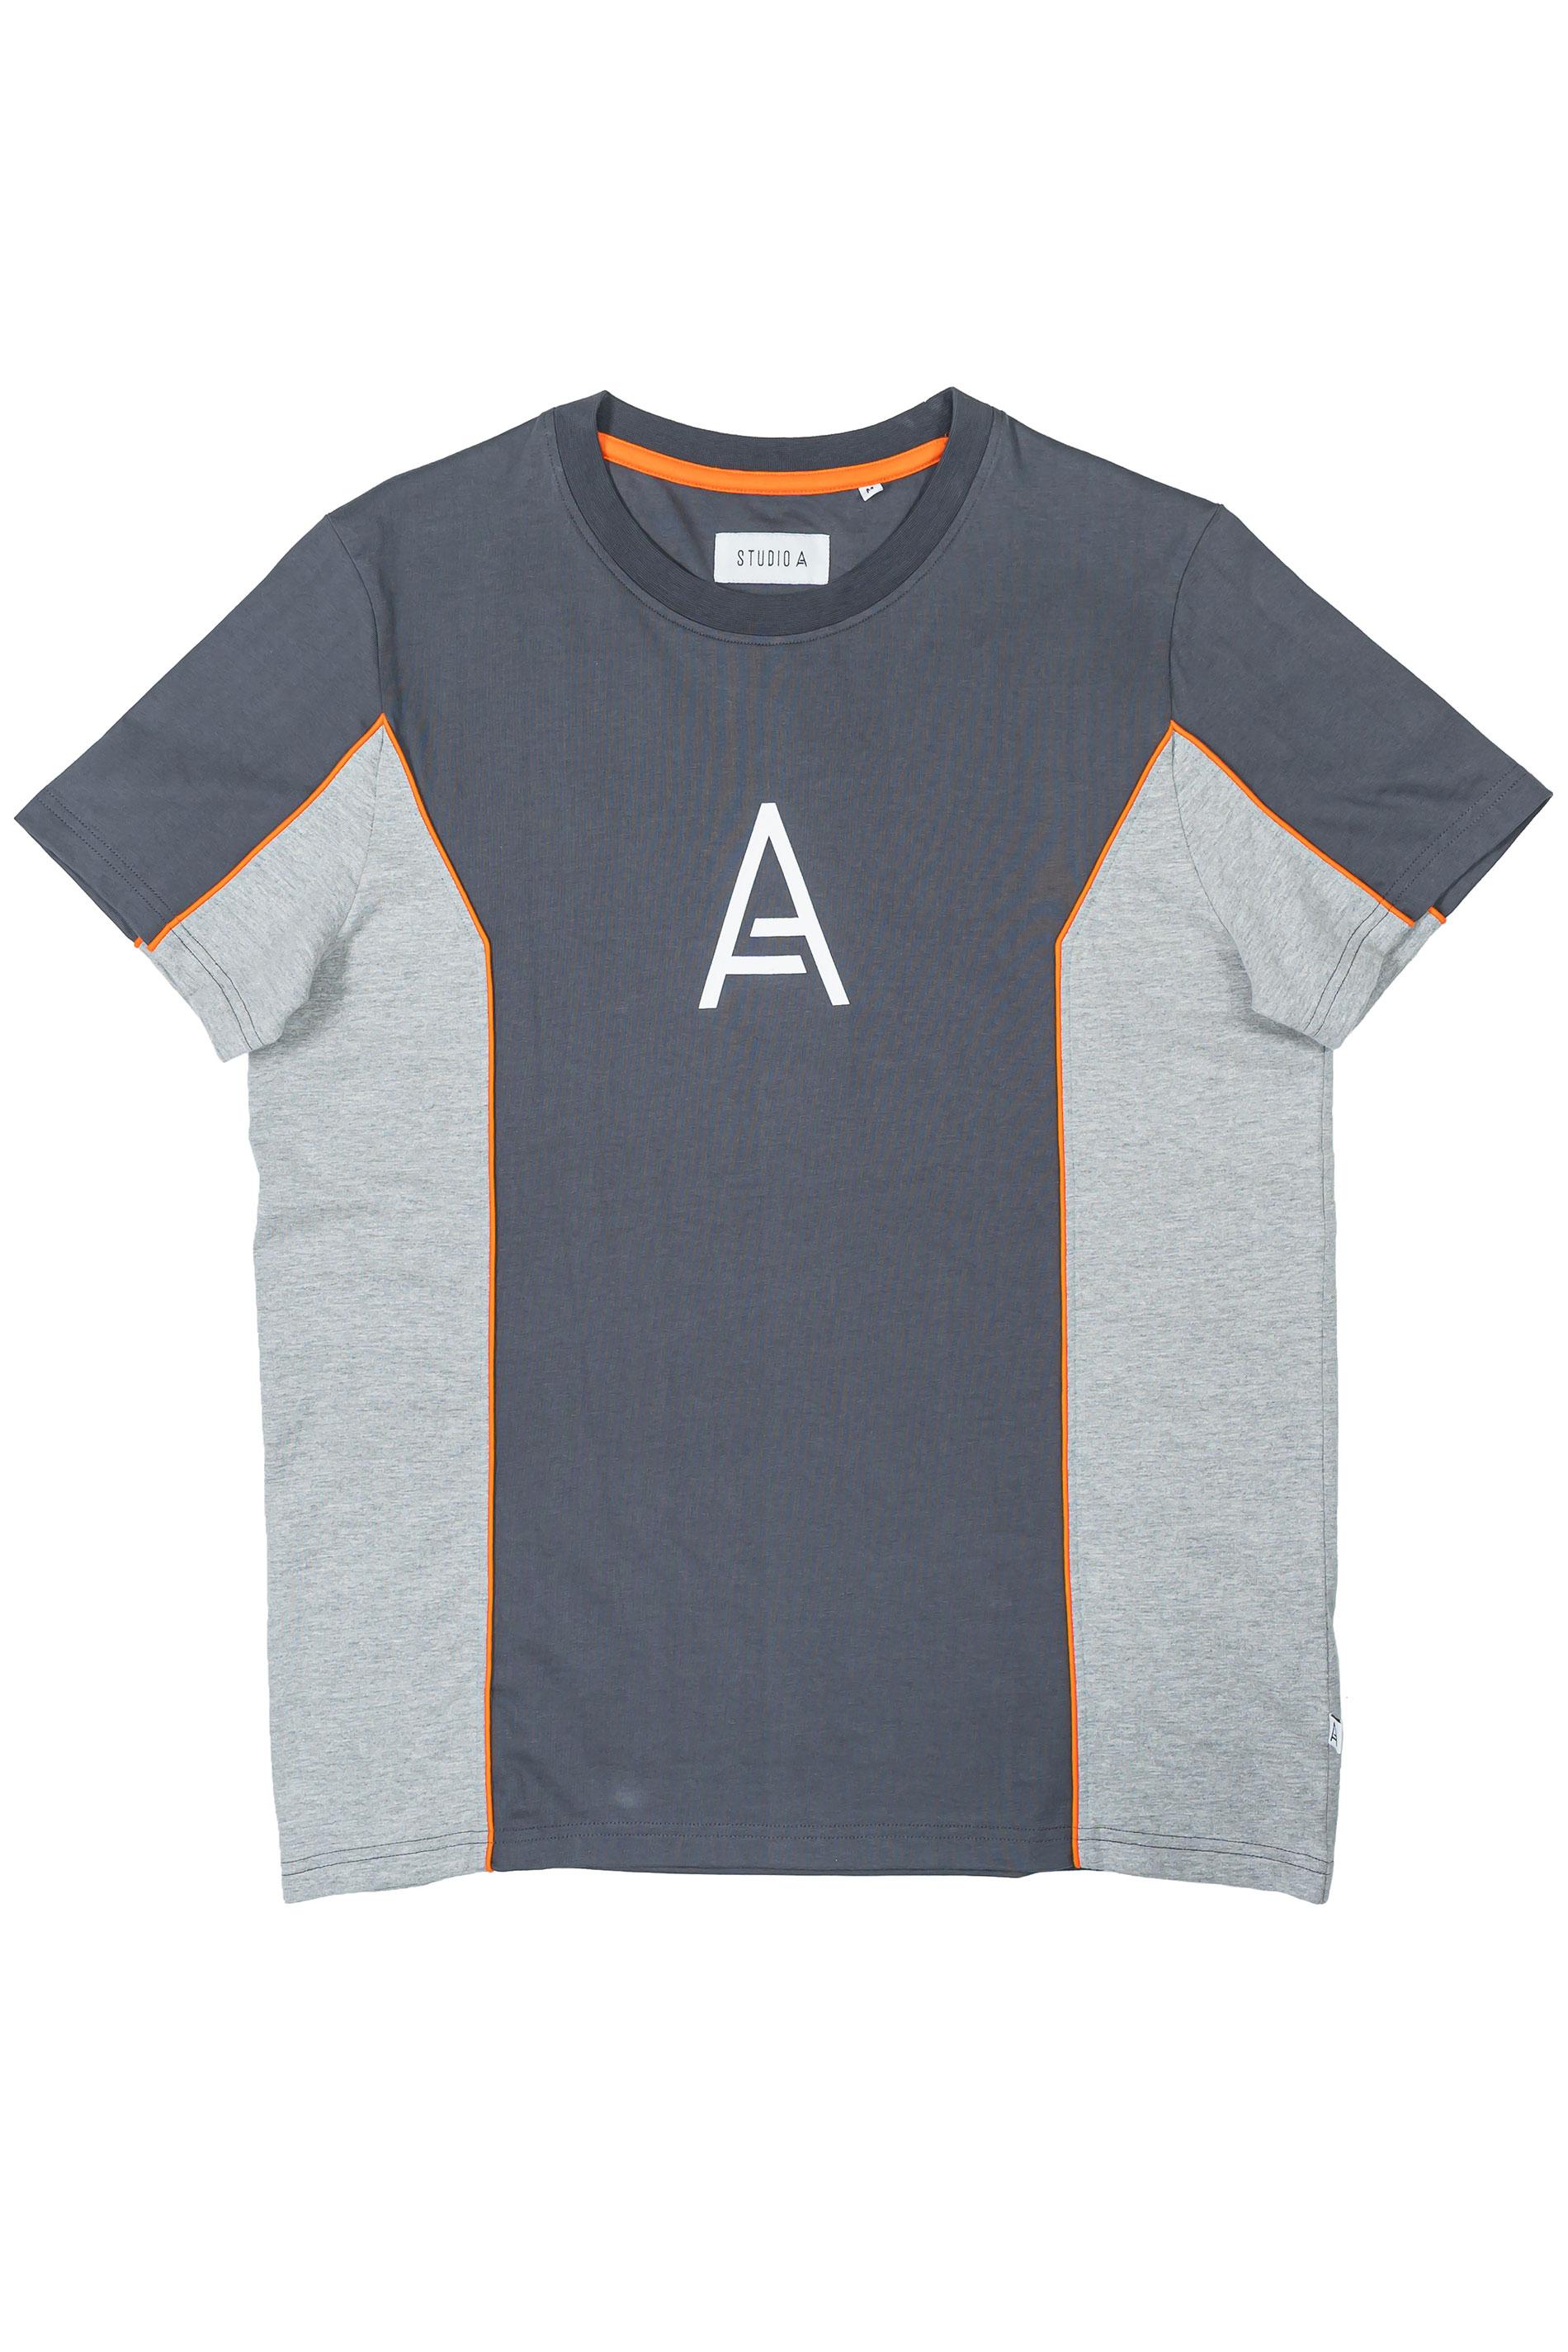 STUDIO A Charcoal Grey Panel Colour Block T-Shirt